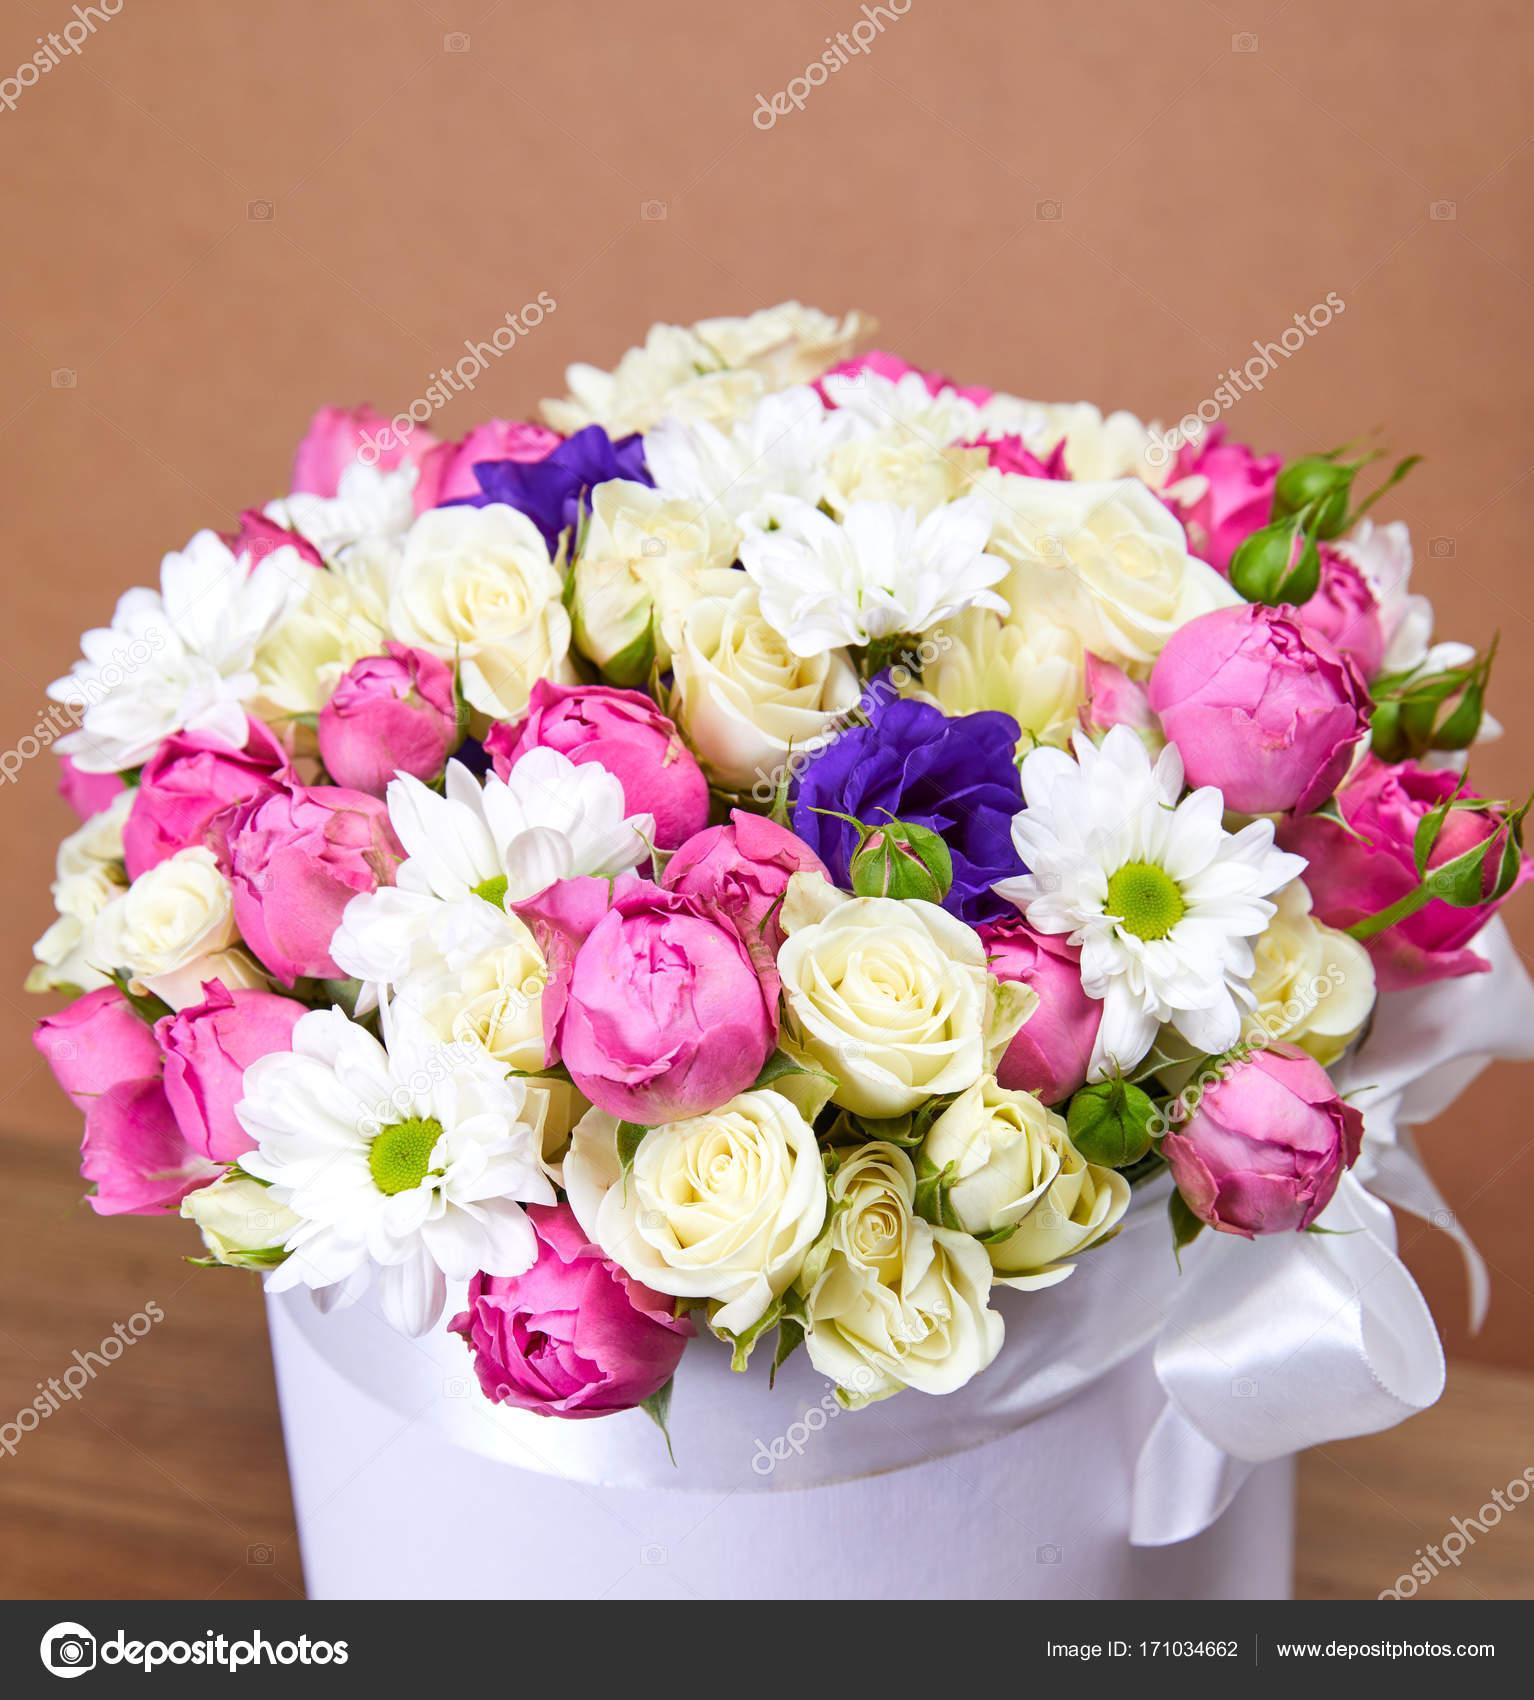 Nice Bright Flower Bouquet Close Stock Photo Strelok 171034662